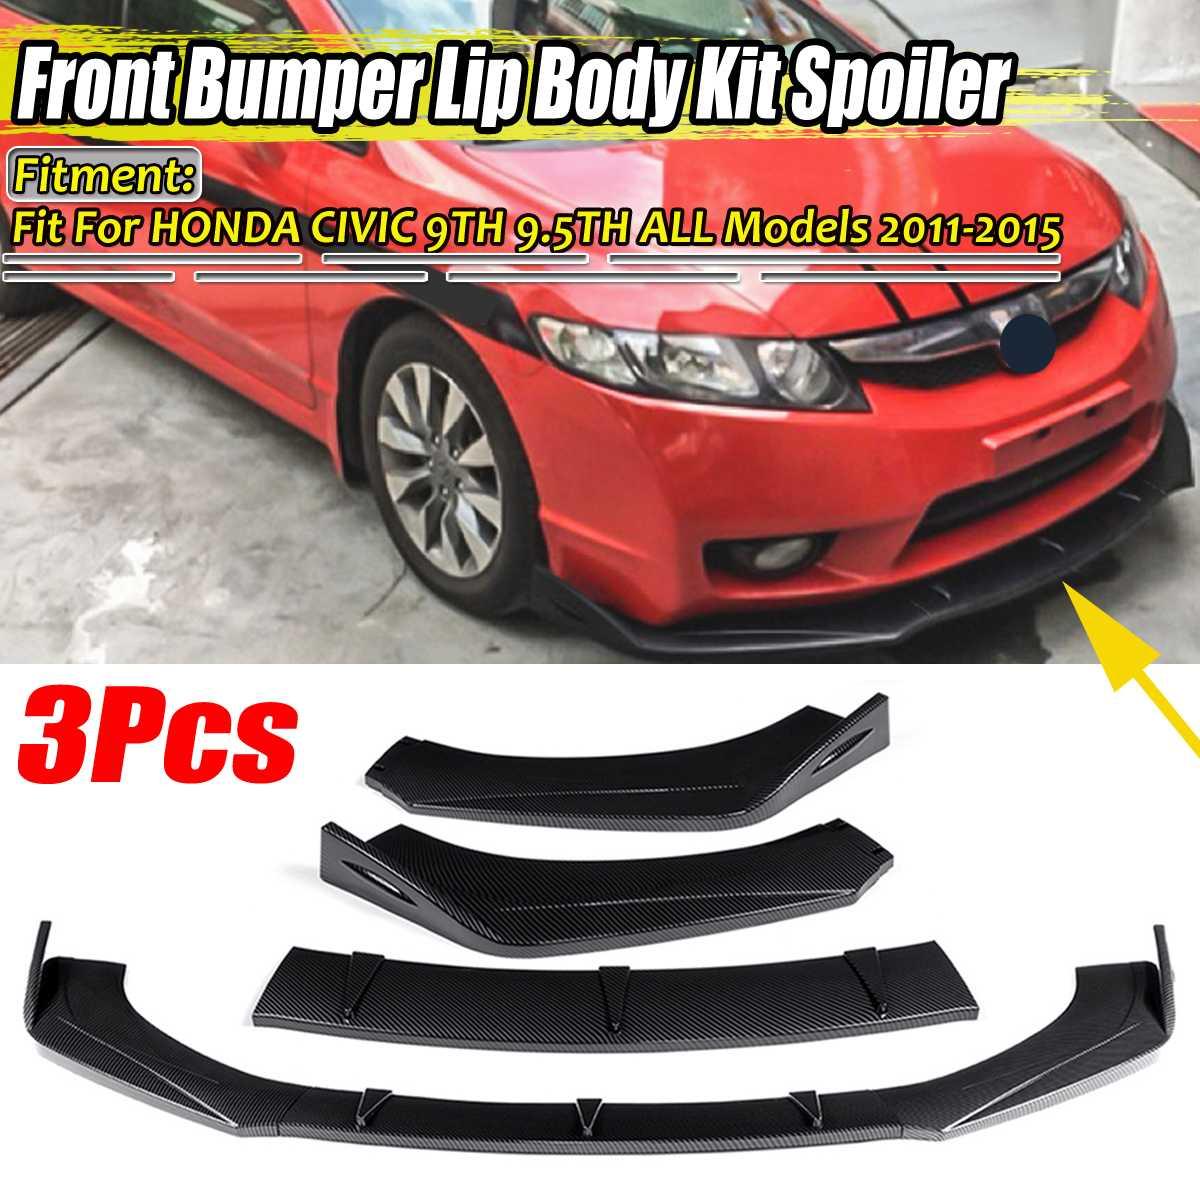 3 Pieces Universal Car Front Bumper Splitter Lip Diffuser Spoiler For HONDA For Civic For ACCORD 6TH 9TH 9.5TH 10TH EK EG S2000